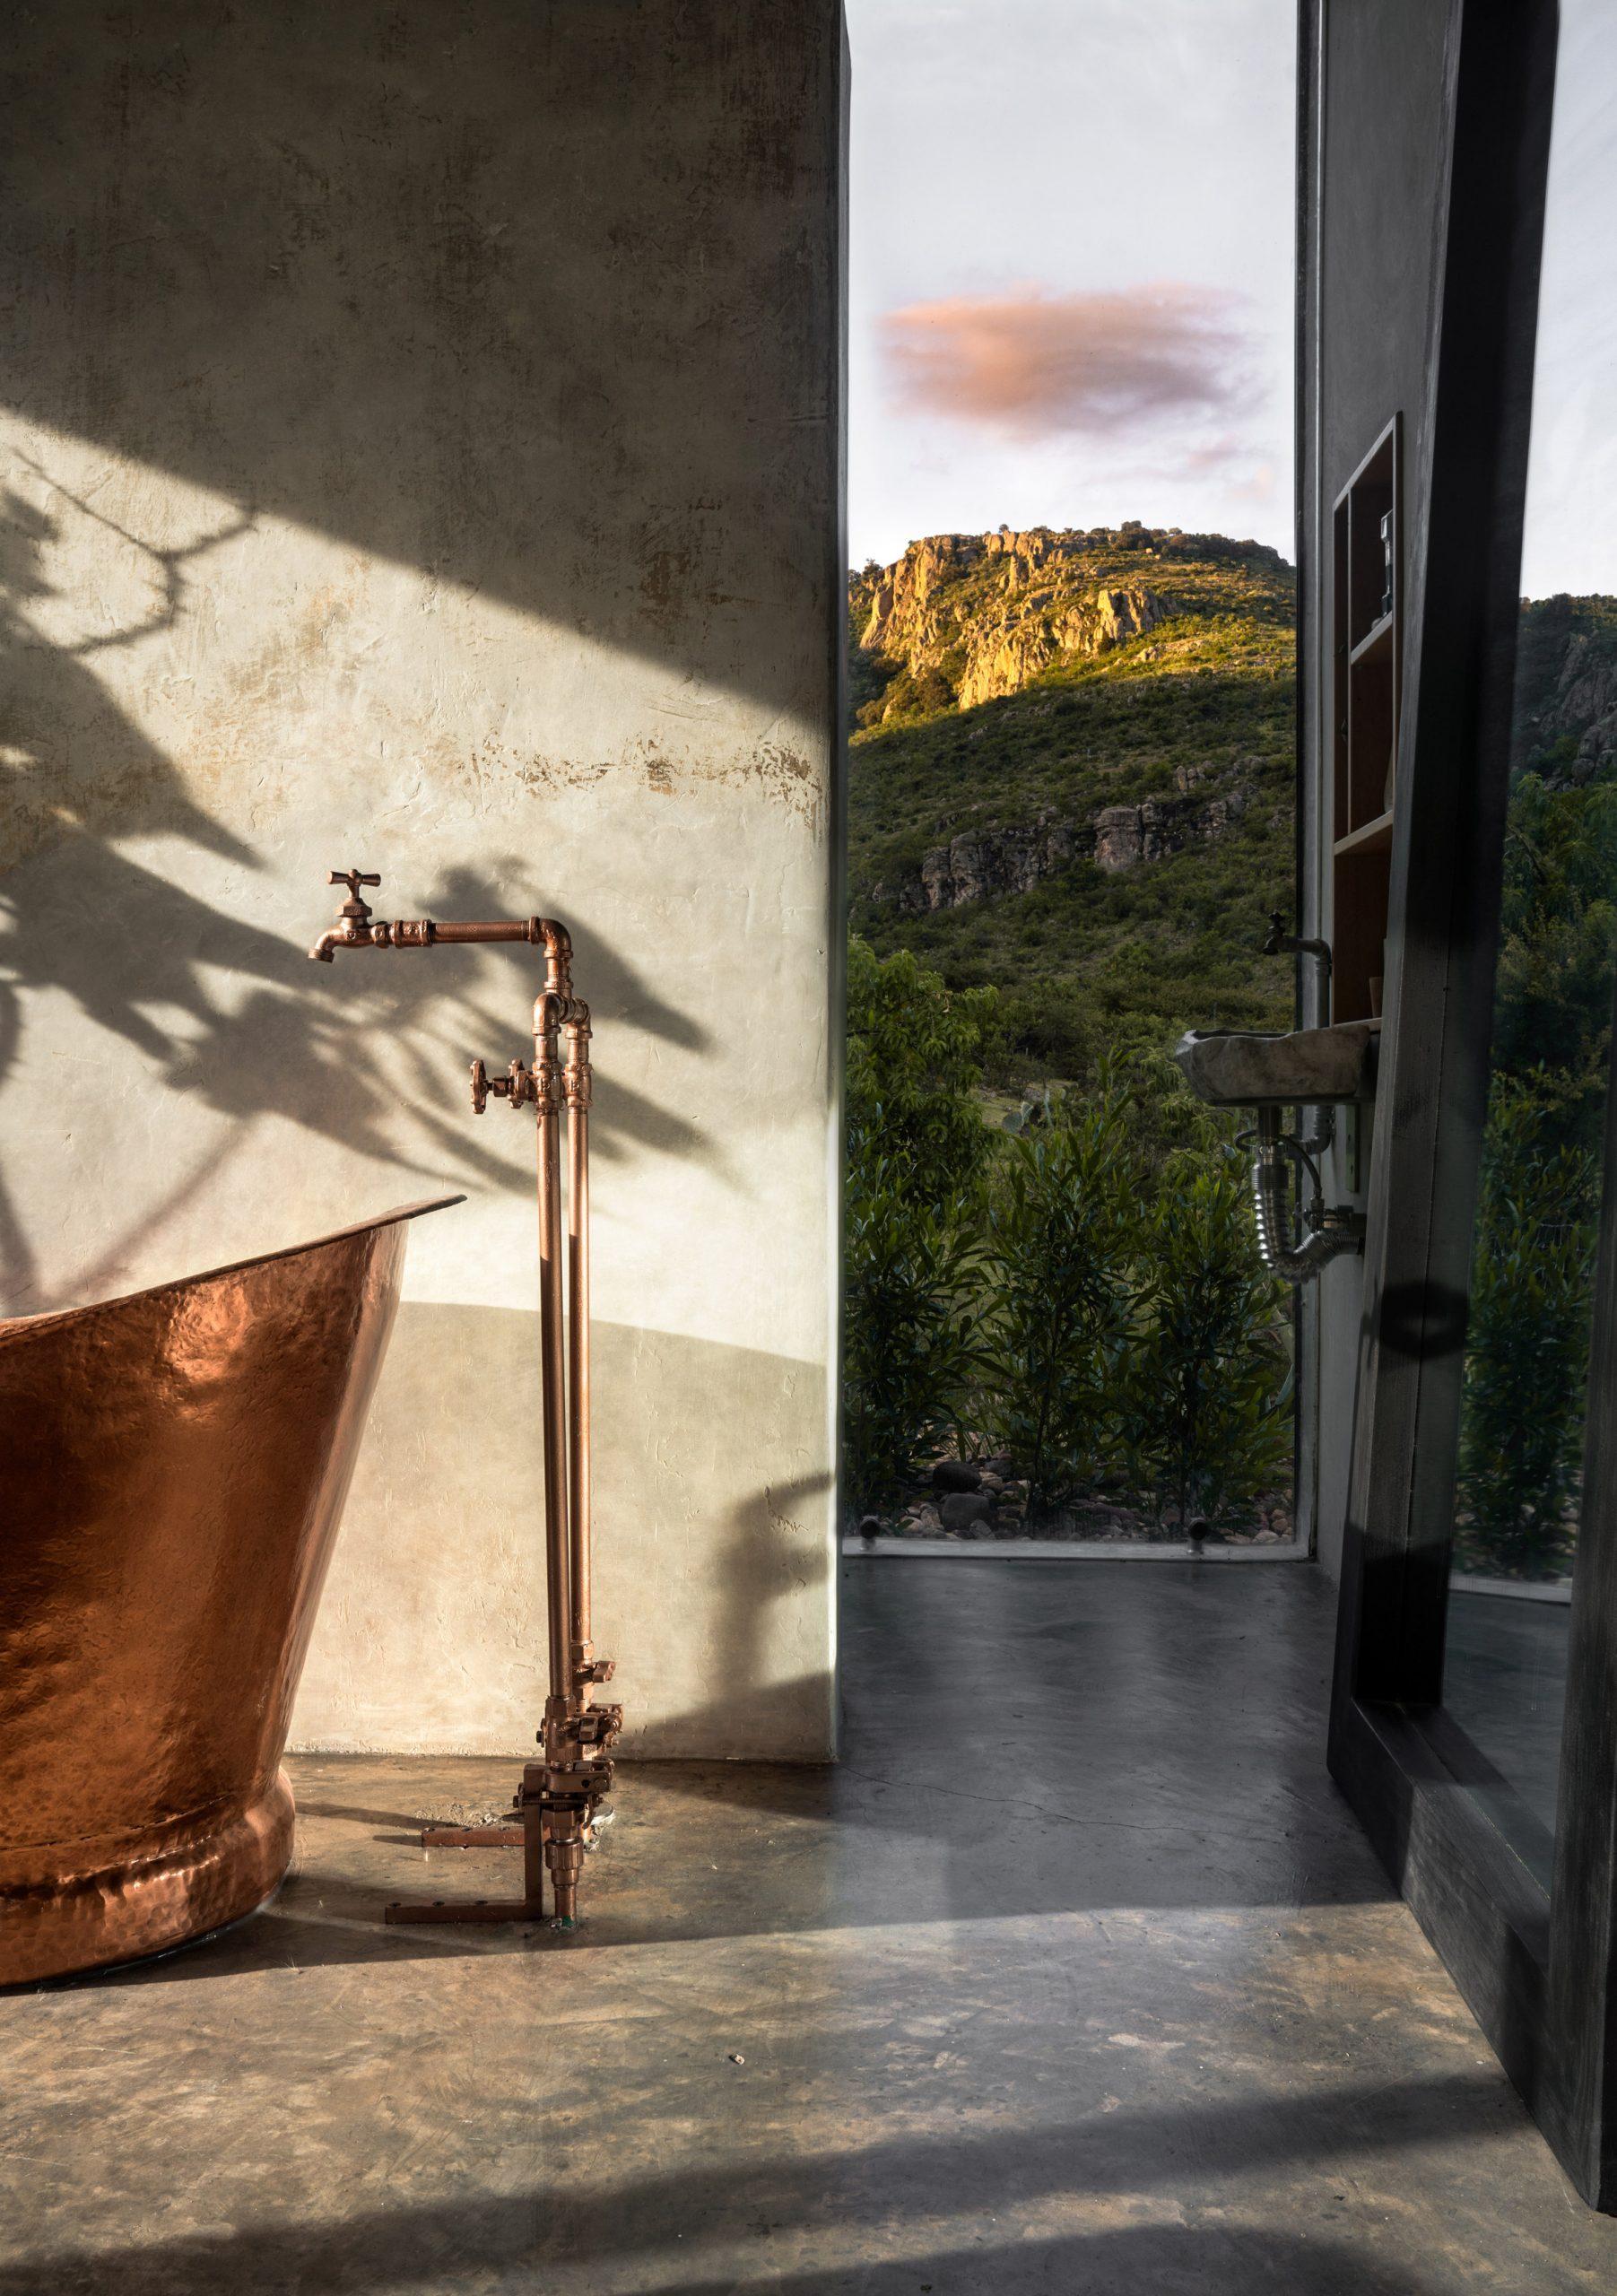 Bathroom and copper tub of Casa Eterea cabin by Prashant Ashoka